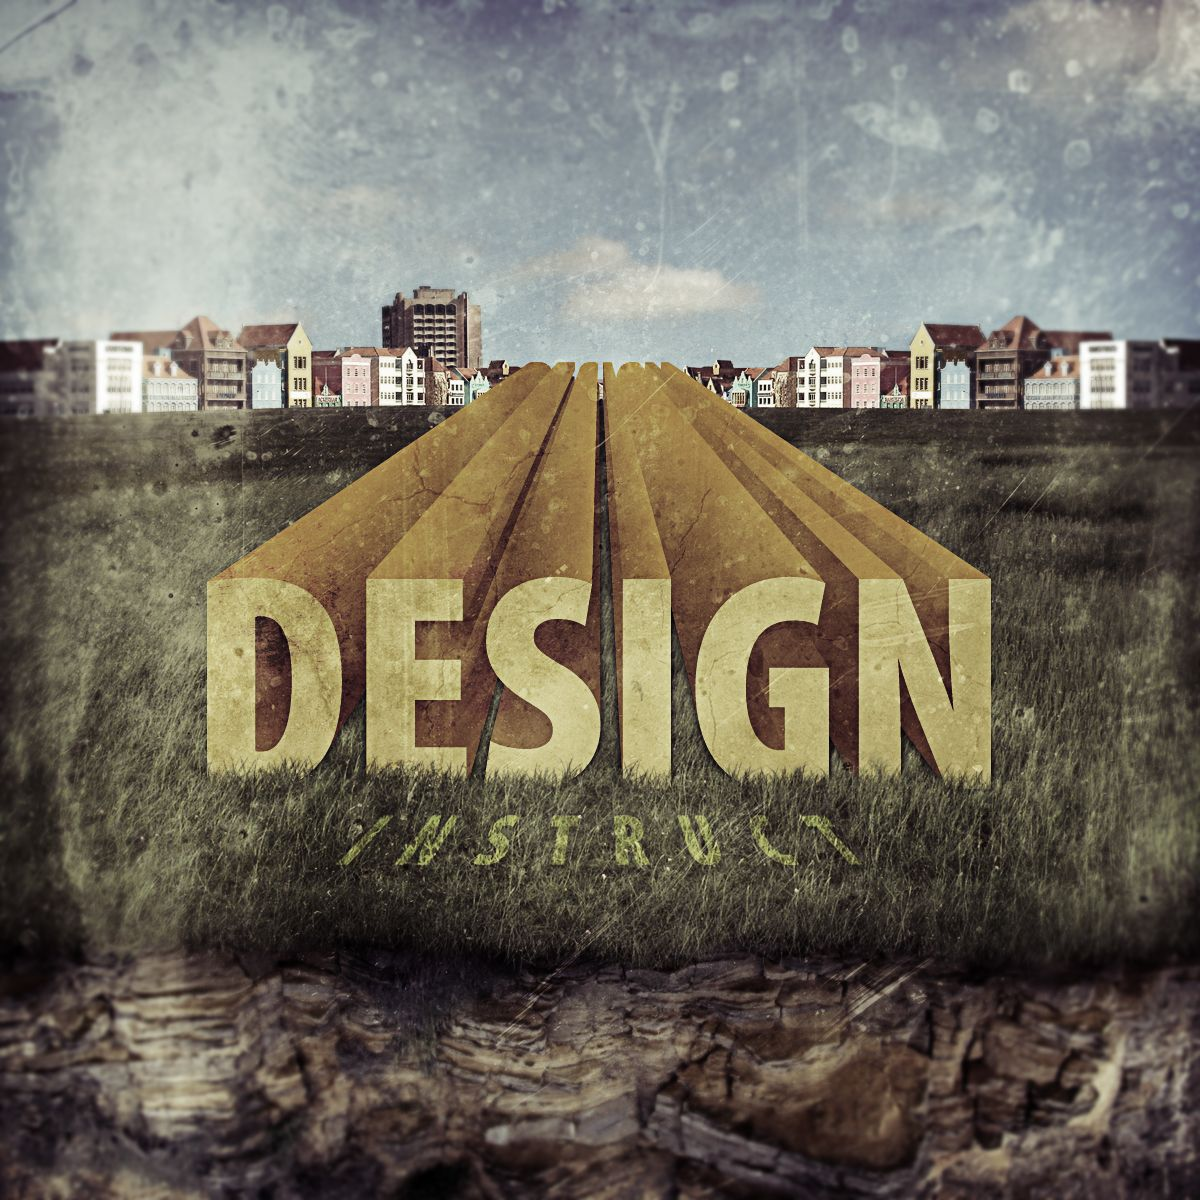 3d poster design tutorial - Tutorial Create Stunning 3d Text In A Grungy Landscape